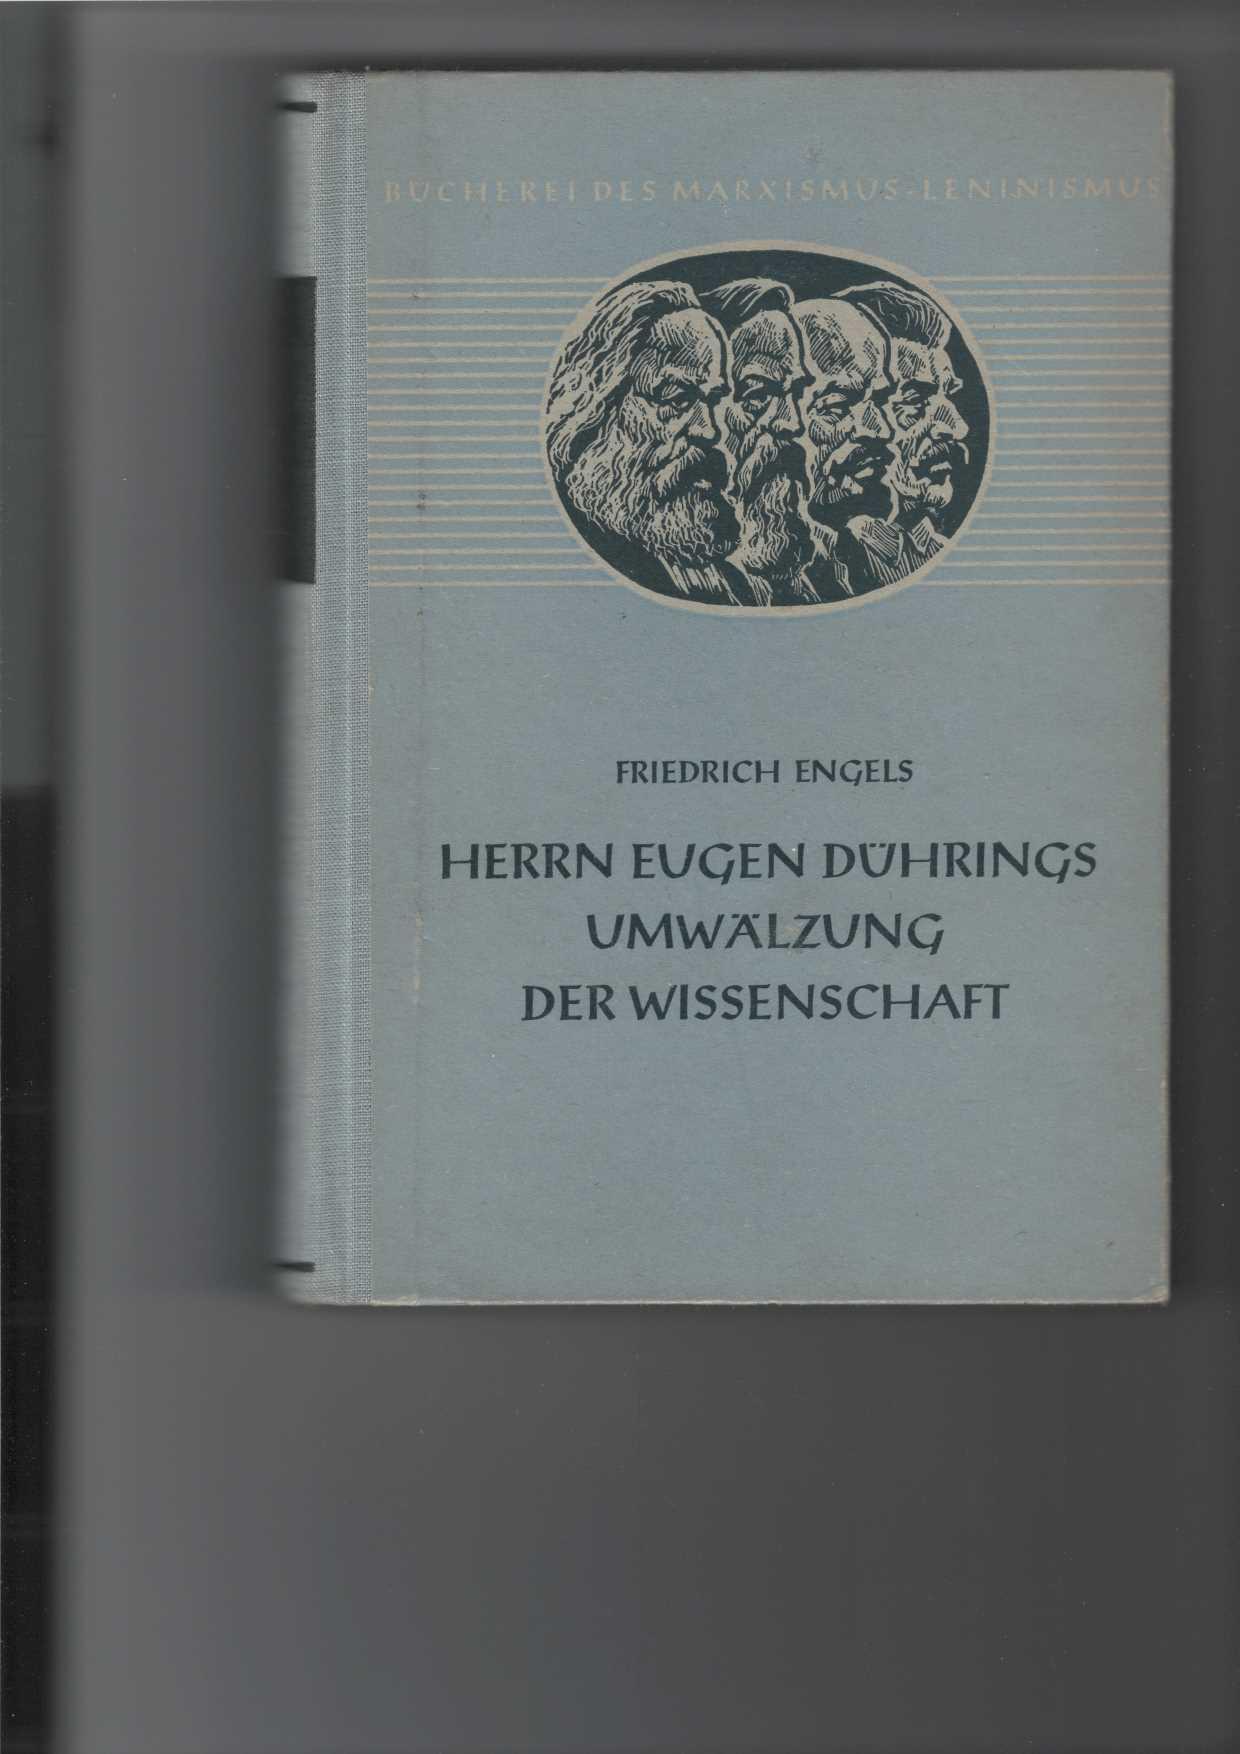 Engels, Friedrich: Herrn Eugen Dührings Umwälzung der Wissenschaft (Anti-Dühring). Bücherei des Marxismus-Leninismus, Band 3. [4. Aufl.], 51. - 60. Tsd.,